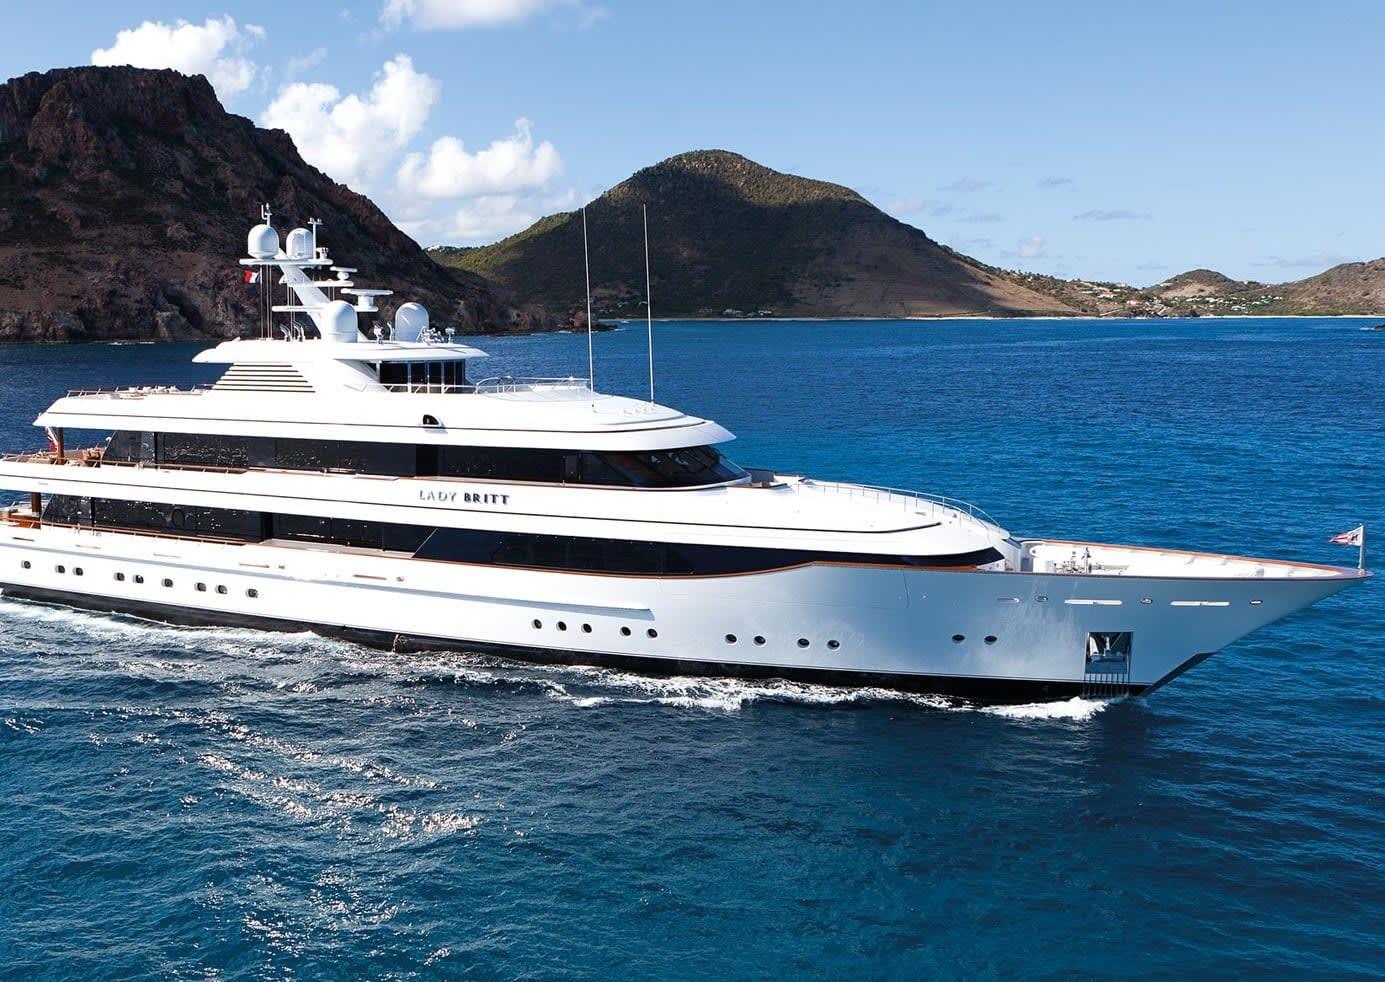 Image of Lady Britt 63.0M (206.7FT) motor yacht